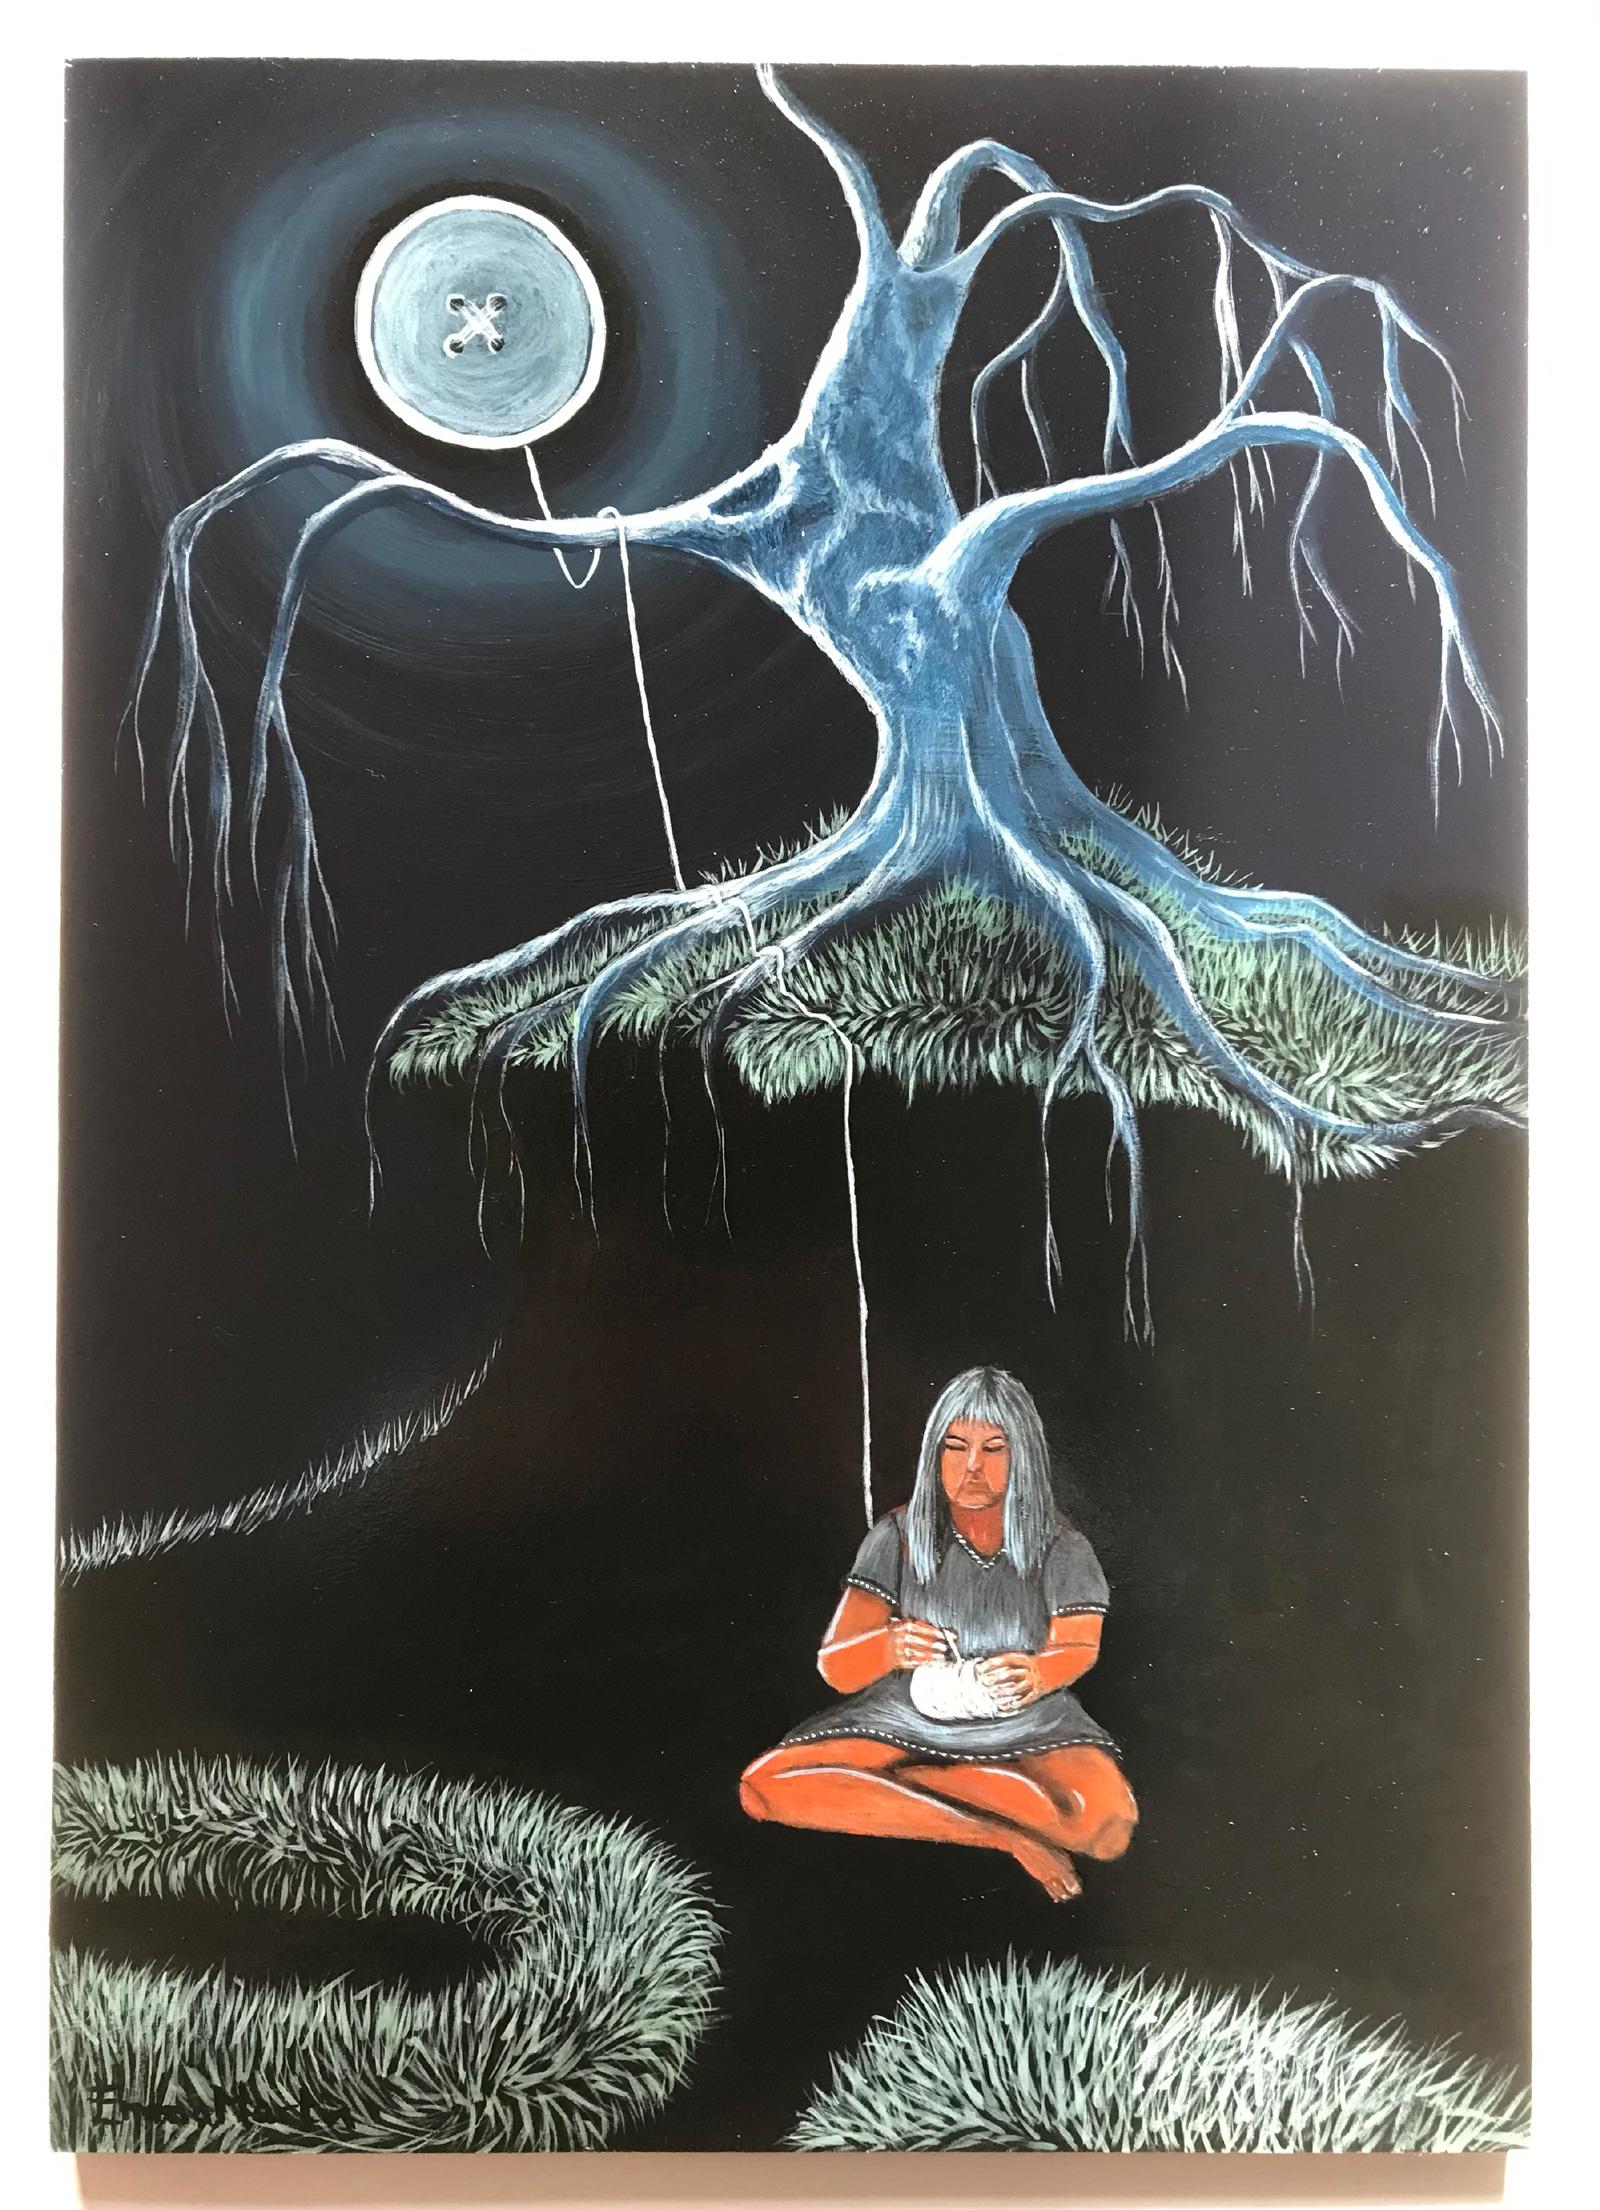 emma-martin-drawing-the-moon_51164280405_o